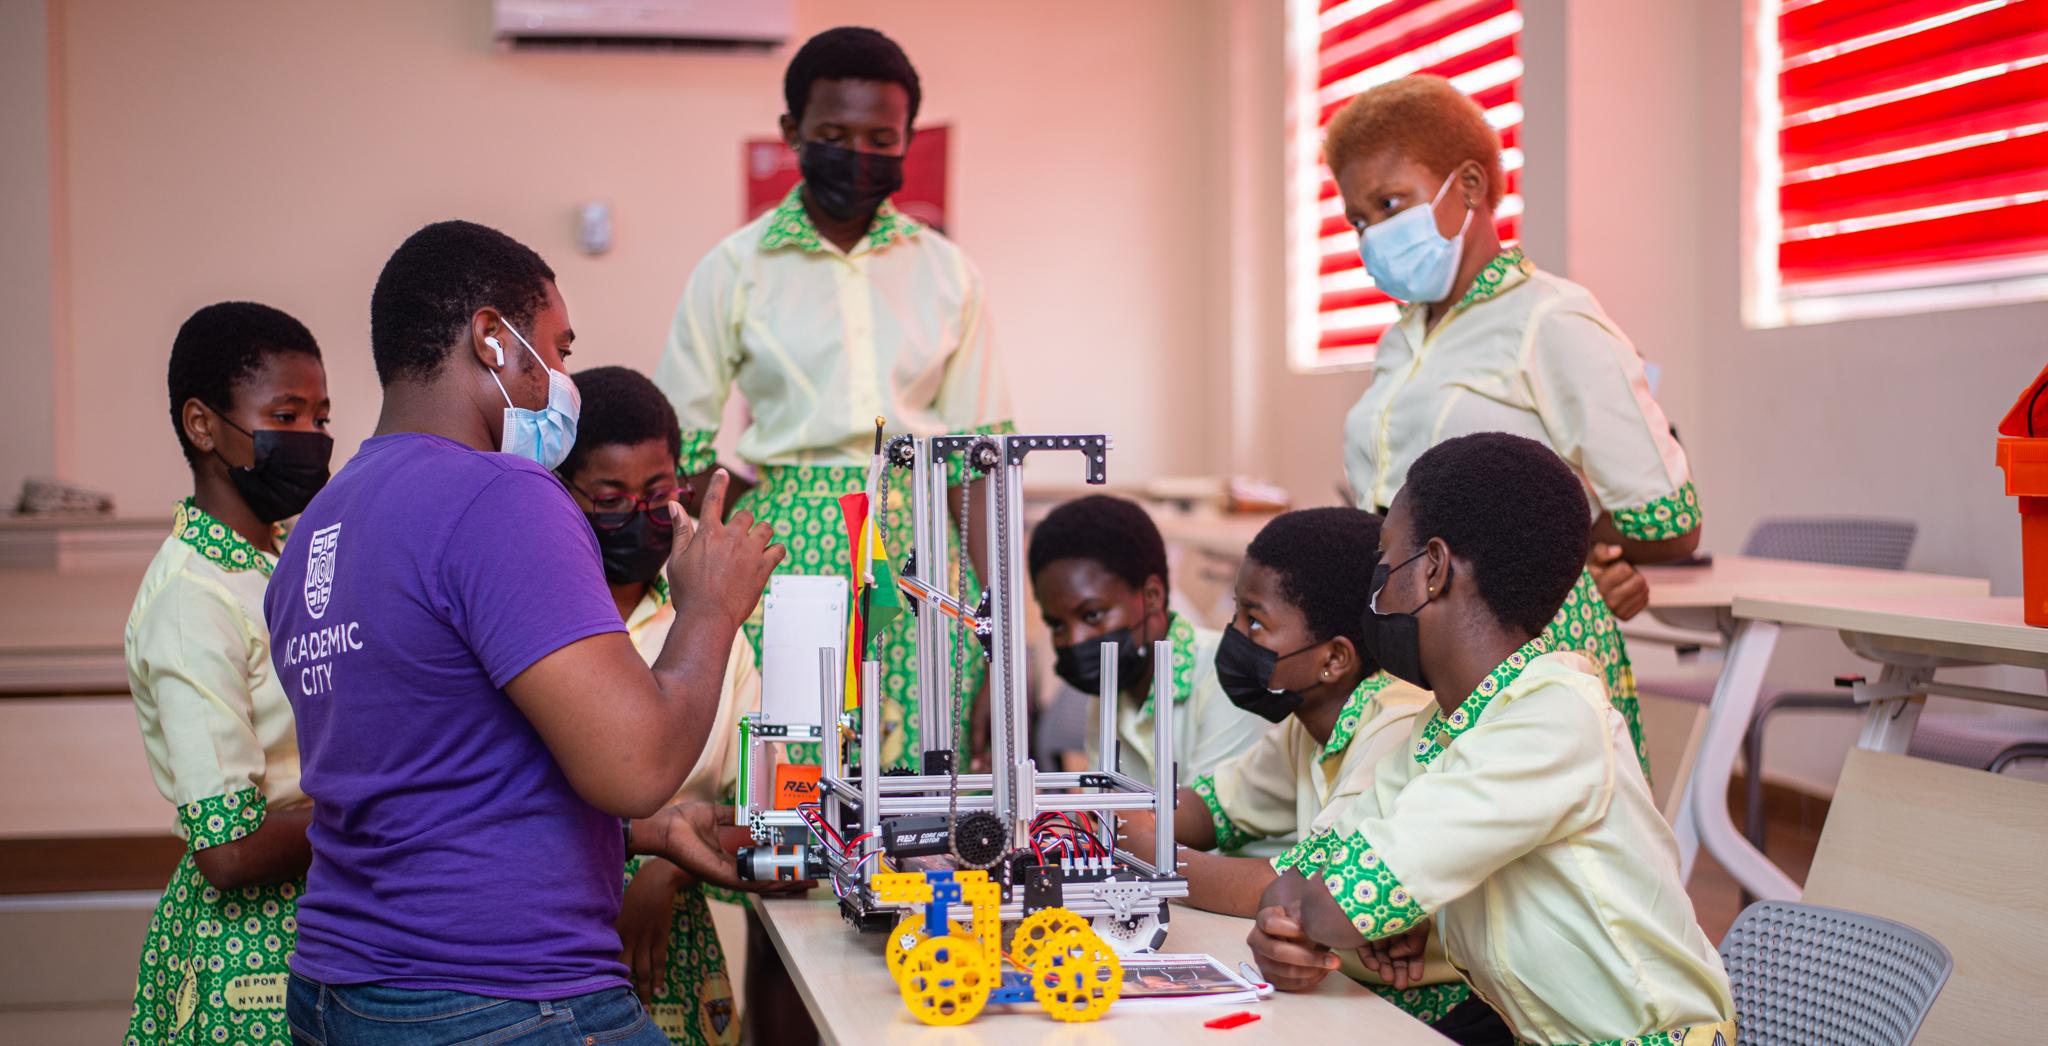 Mentor Benedict Amoako taking the girls through robotics lessons